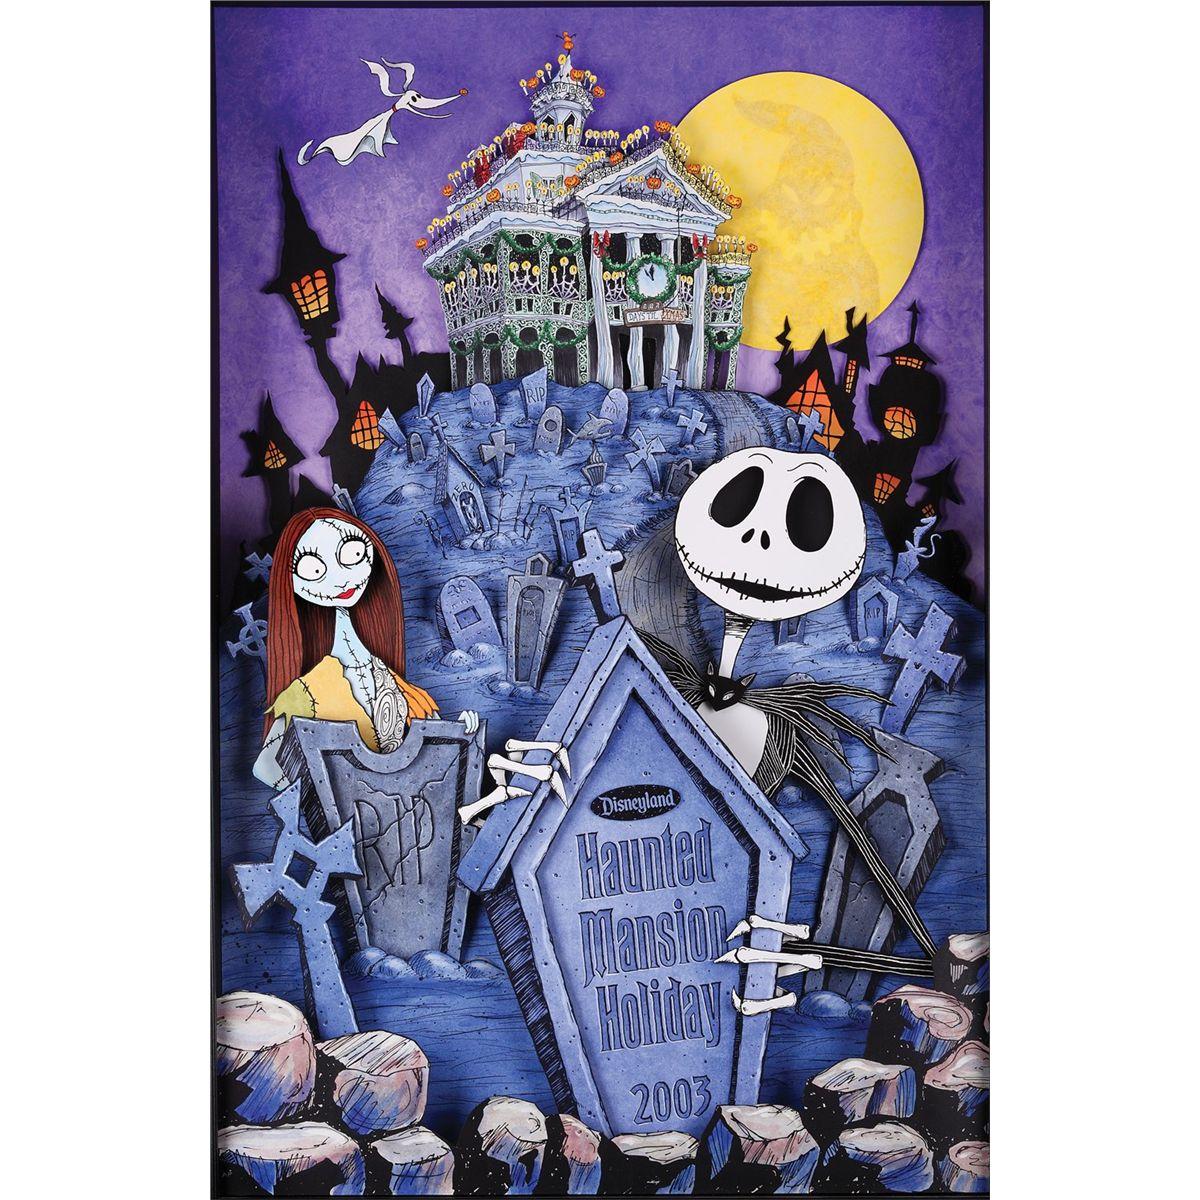 Nightmare Before Christmas Illustration.The Nightmare Before Christmas Disneyland Haunted Mansion Artwork And Shadow Box Display